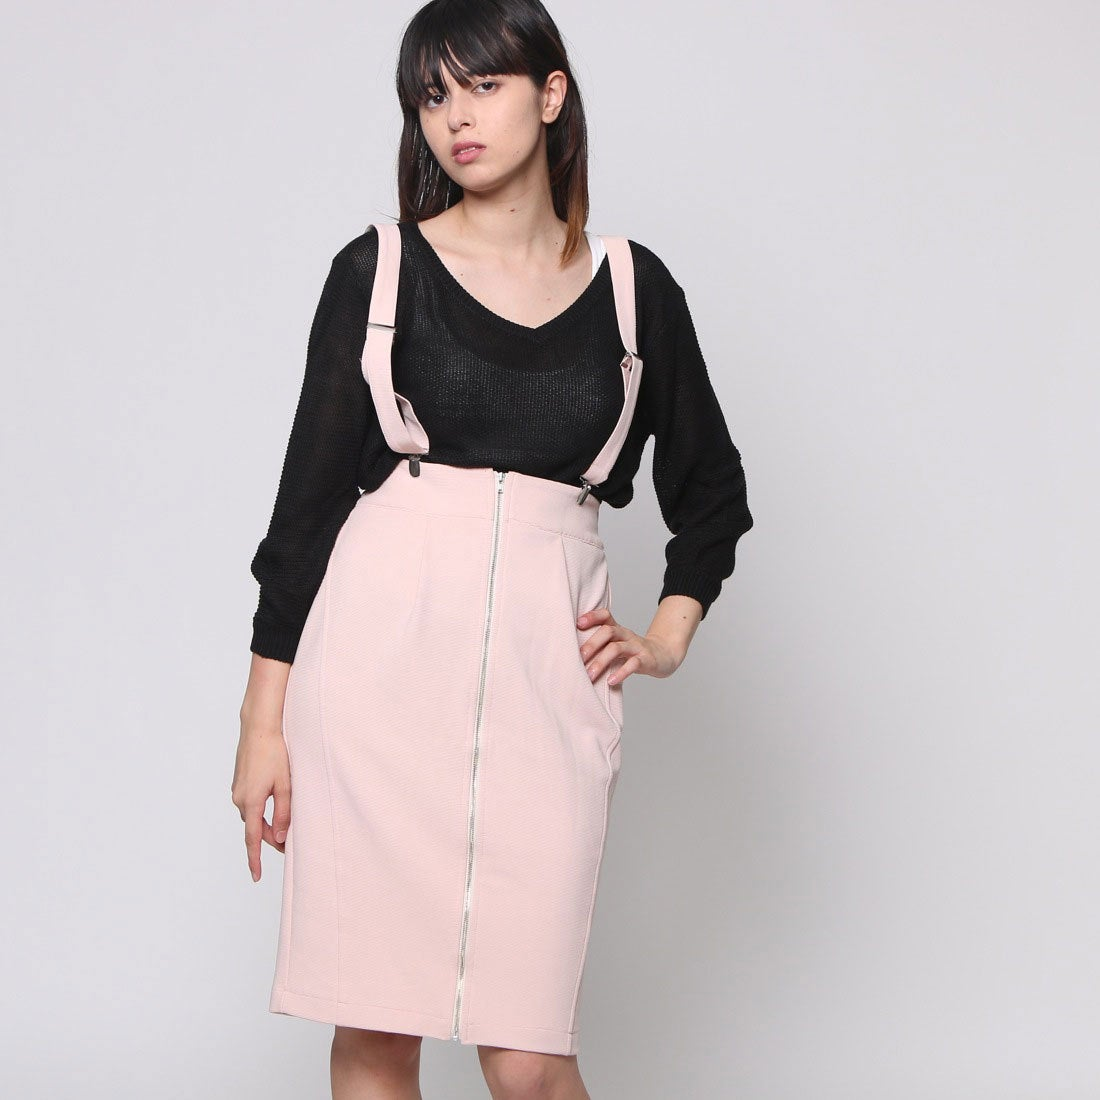 【SALE 80%OFF】アンチュール エミュ Unchulle' emu サスペンダー付きタイトスカート (ピンク)